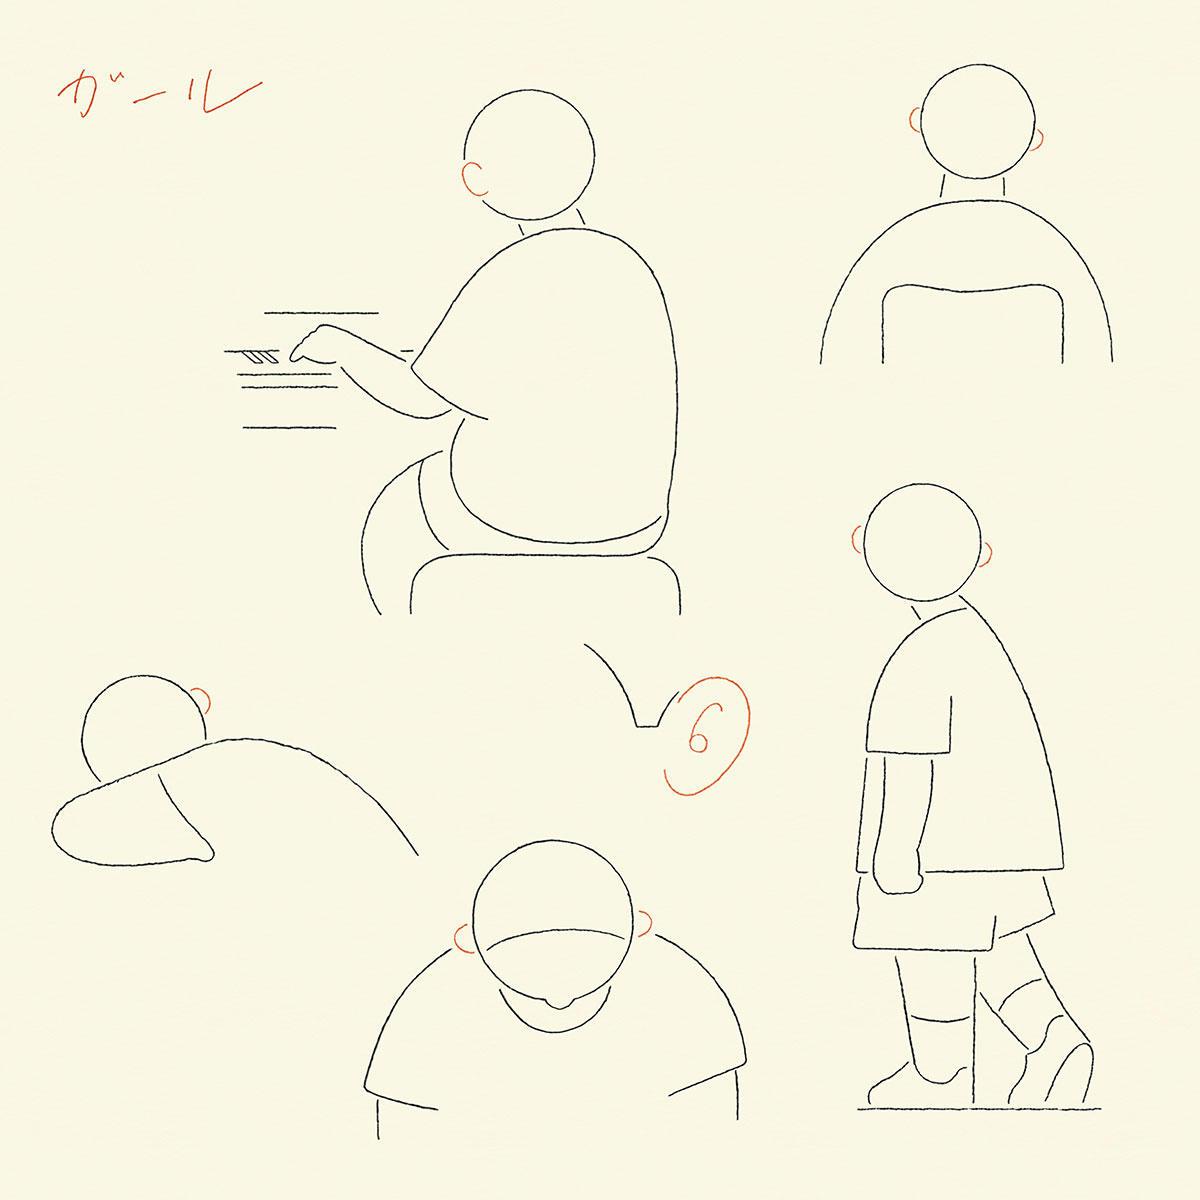 ichi_jk_1200_20210916.jpg